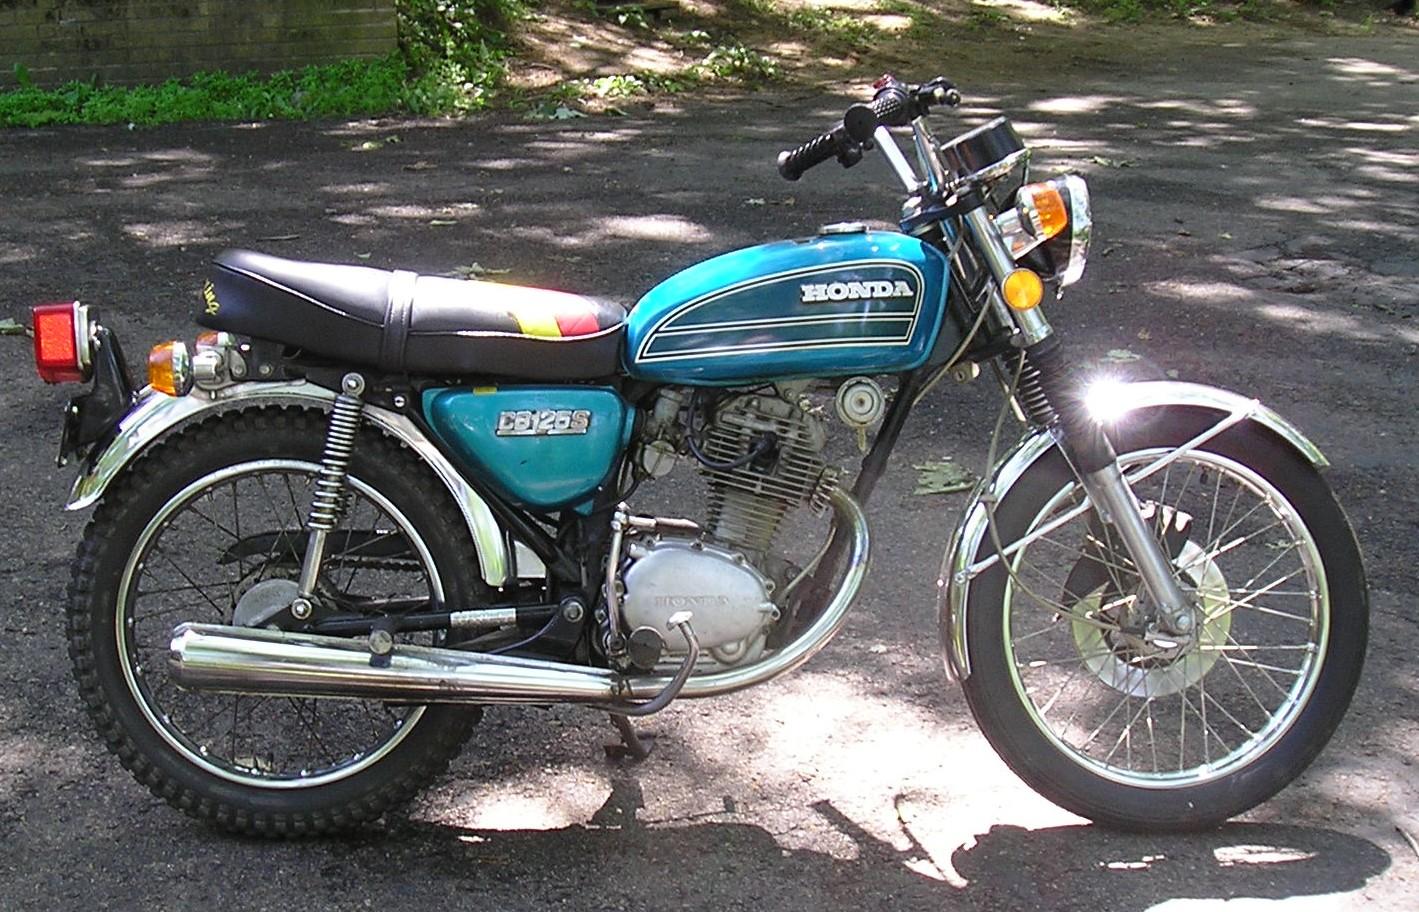 honda cb 125 specs 1979 1980 autoevolution 125cc engine diagram